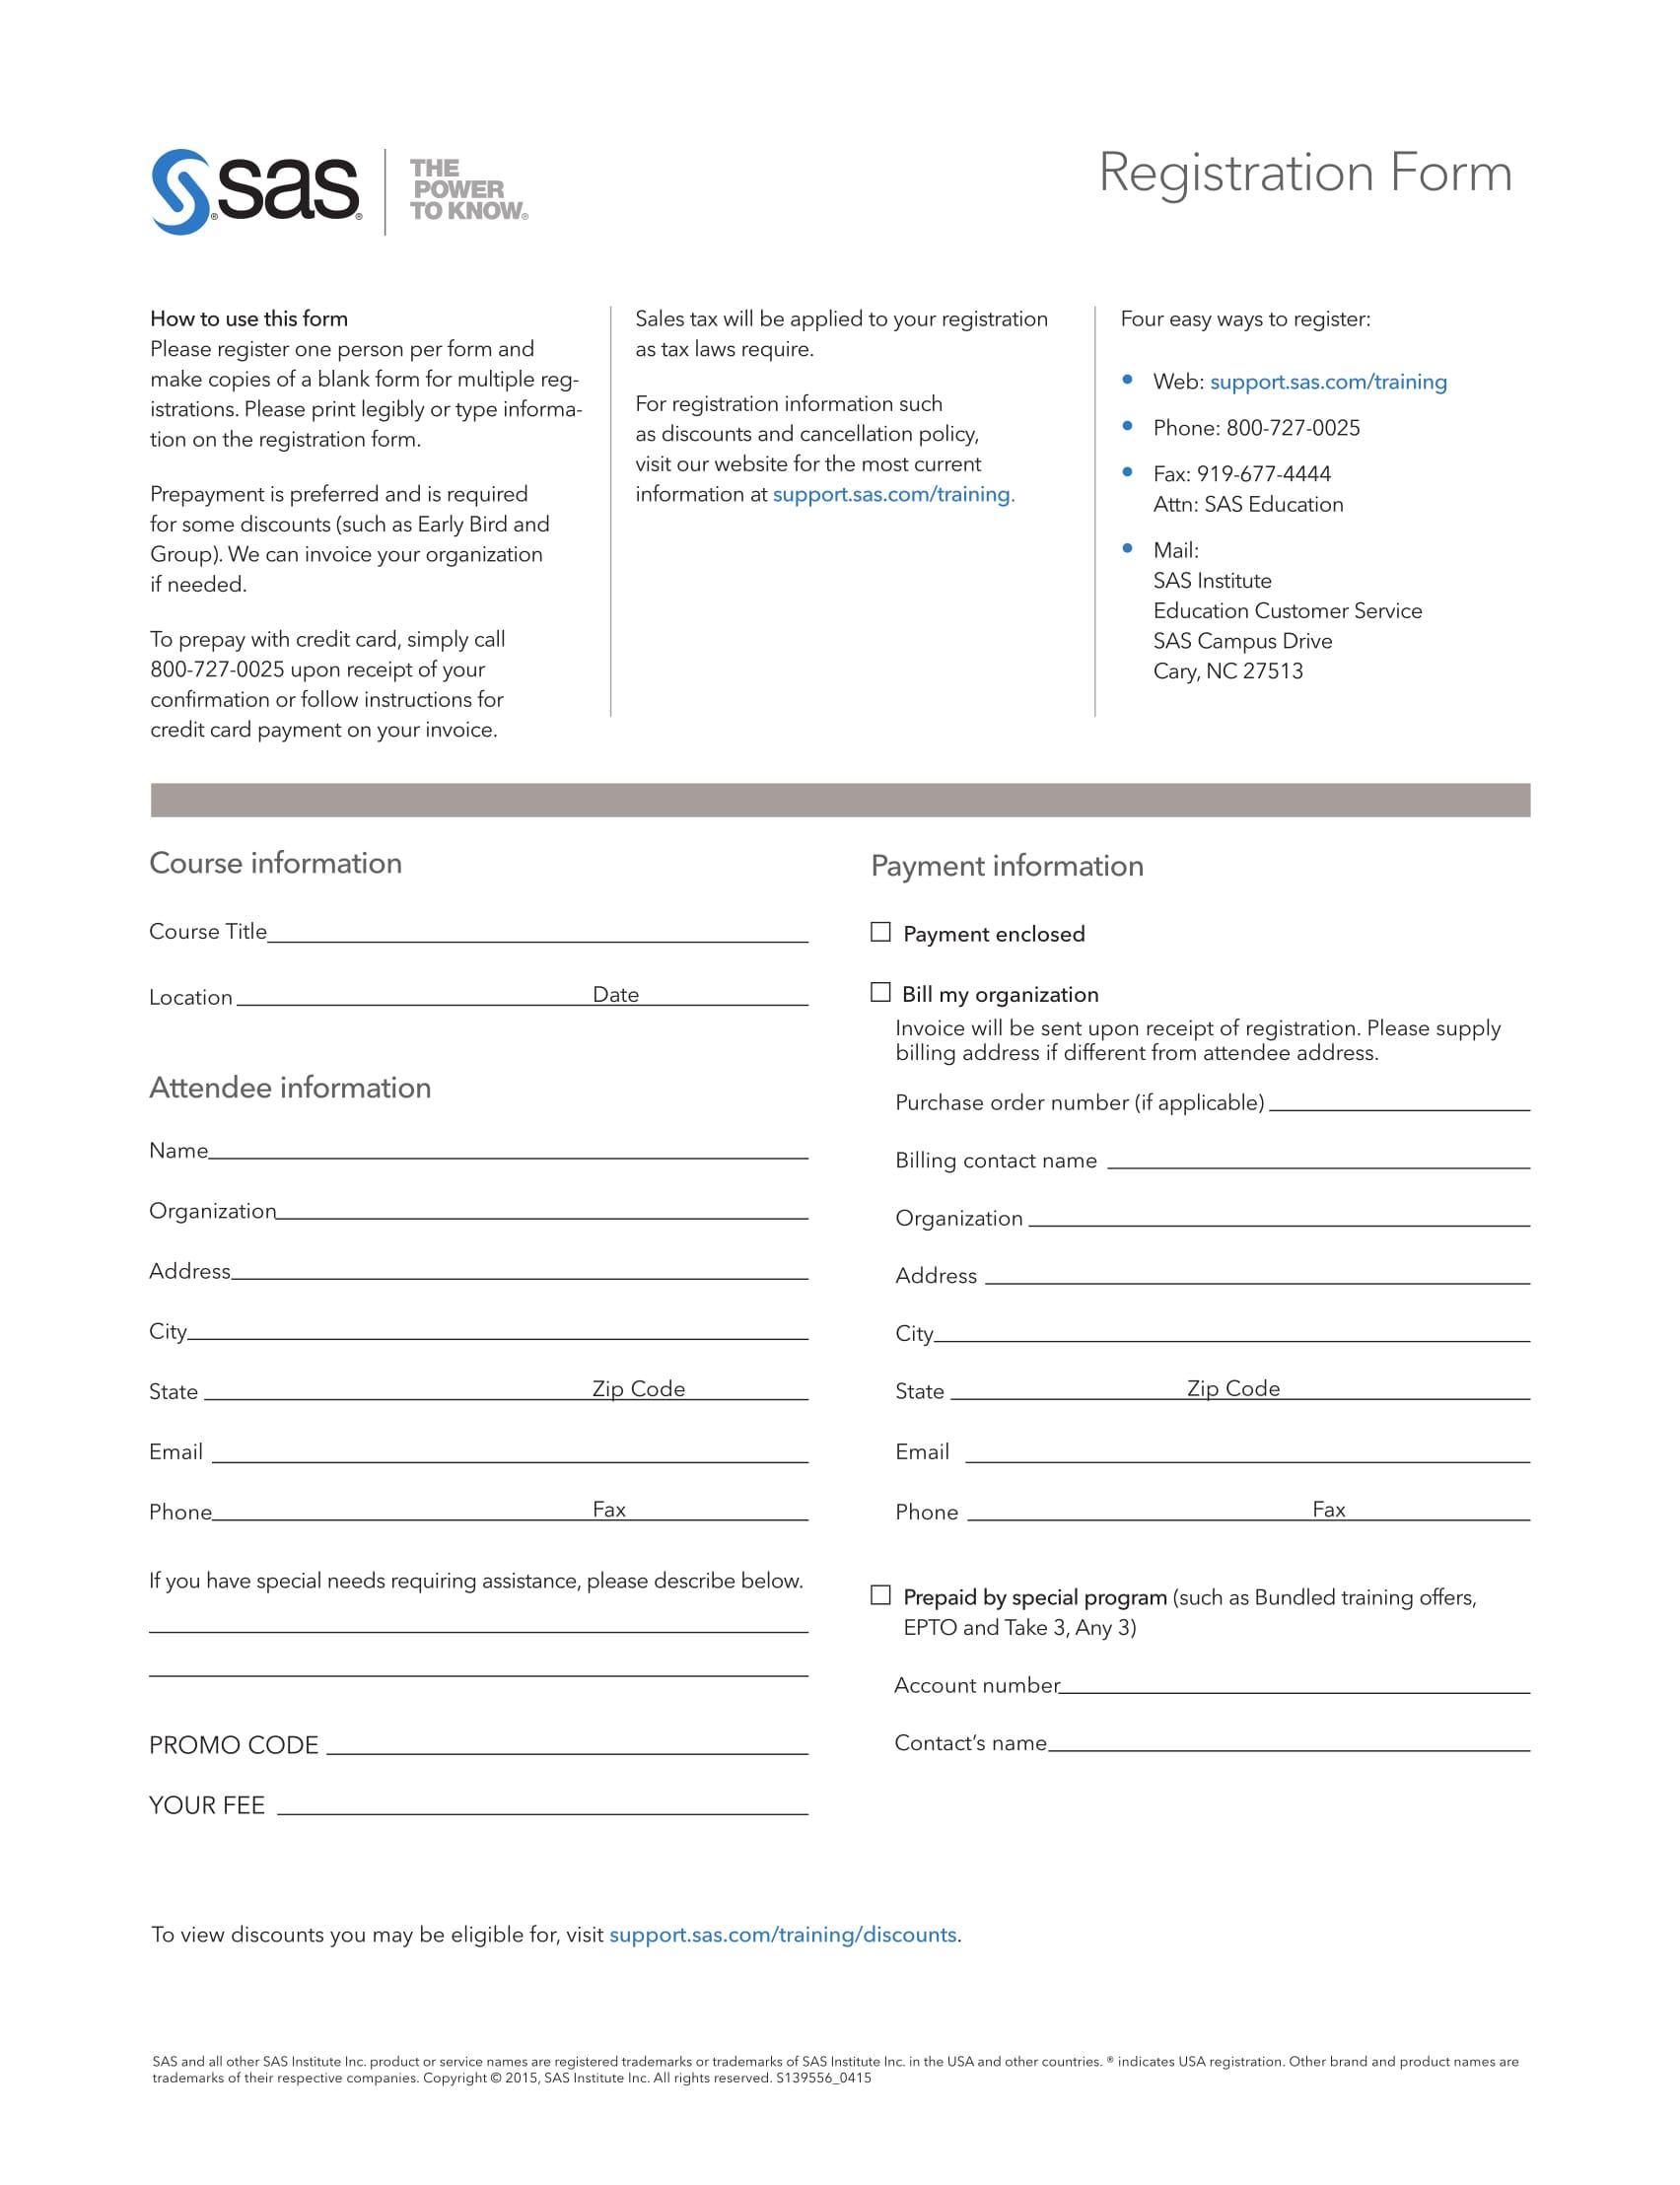 blank training registration form 1